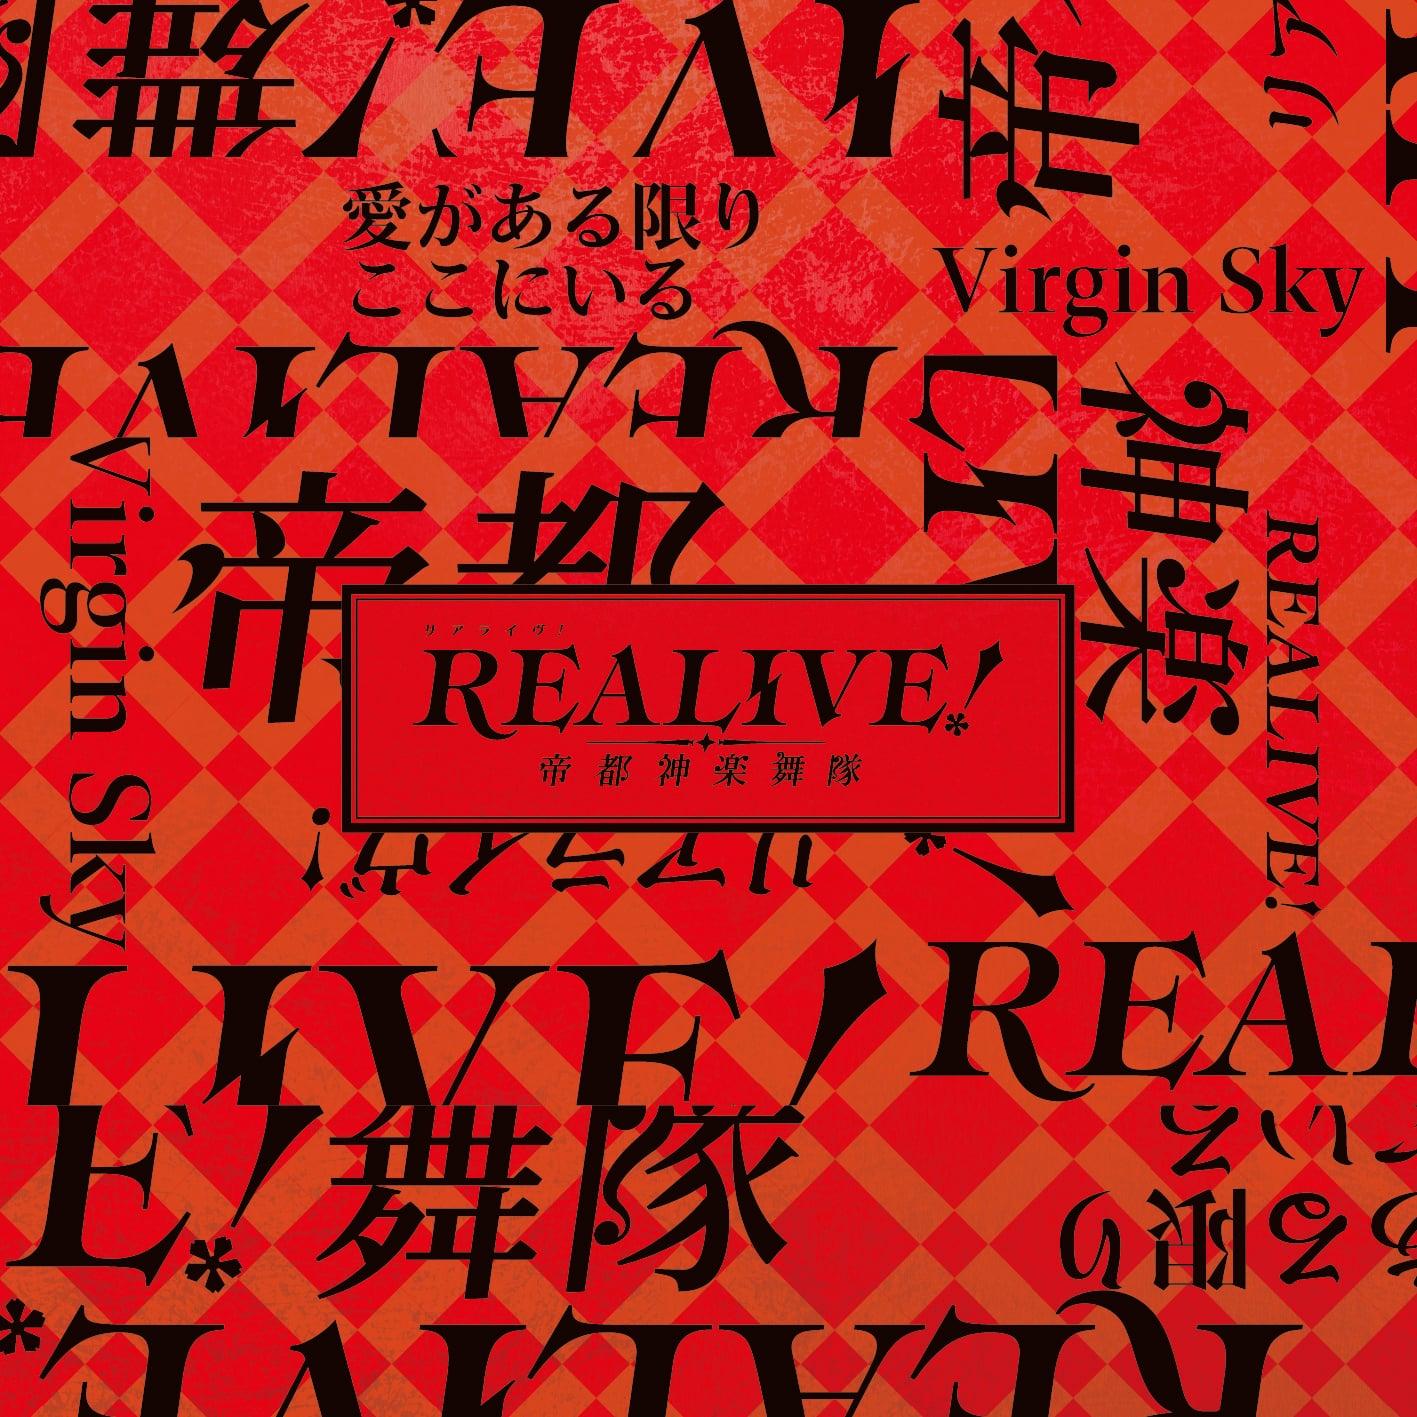 REALIVE! -Teito Kagura Butai- OP&ED: Virgin Sky/Ai ga Aru Kagiri Koko ni Iru   アプリ REALIVE!~帝都神楽舞隊~ OP・ED「Virgin Sky/愛がある限りここにいる」